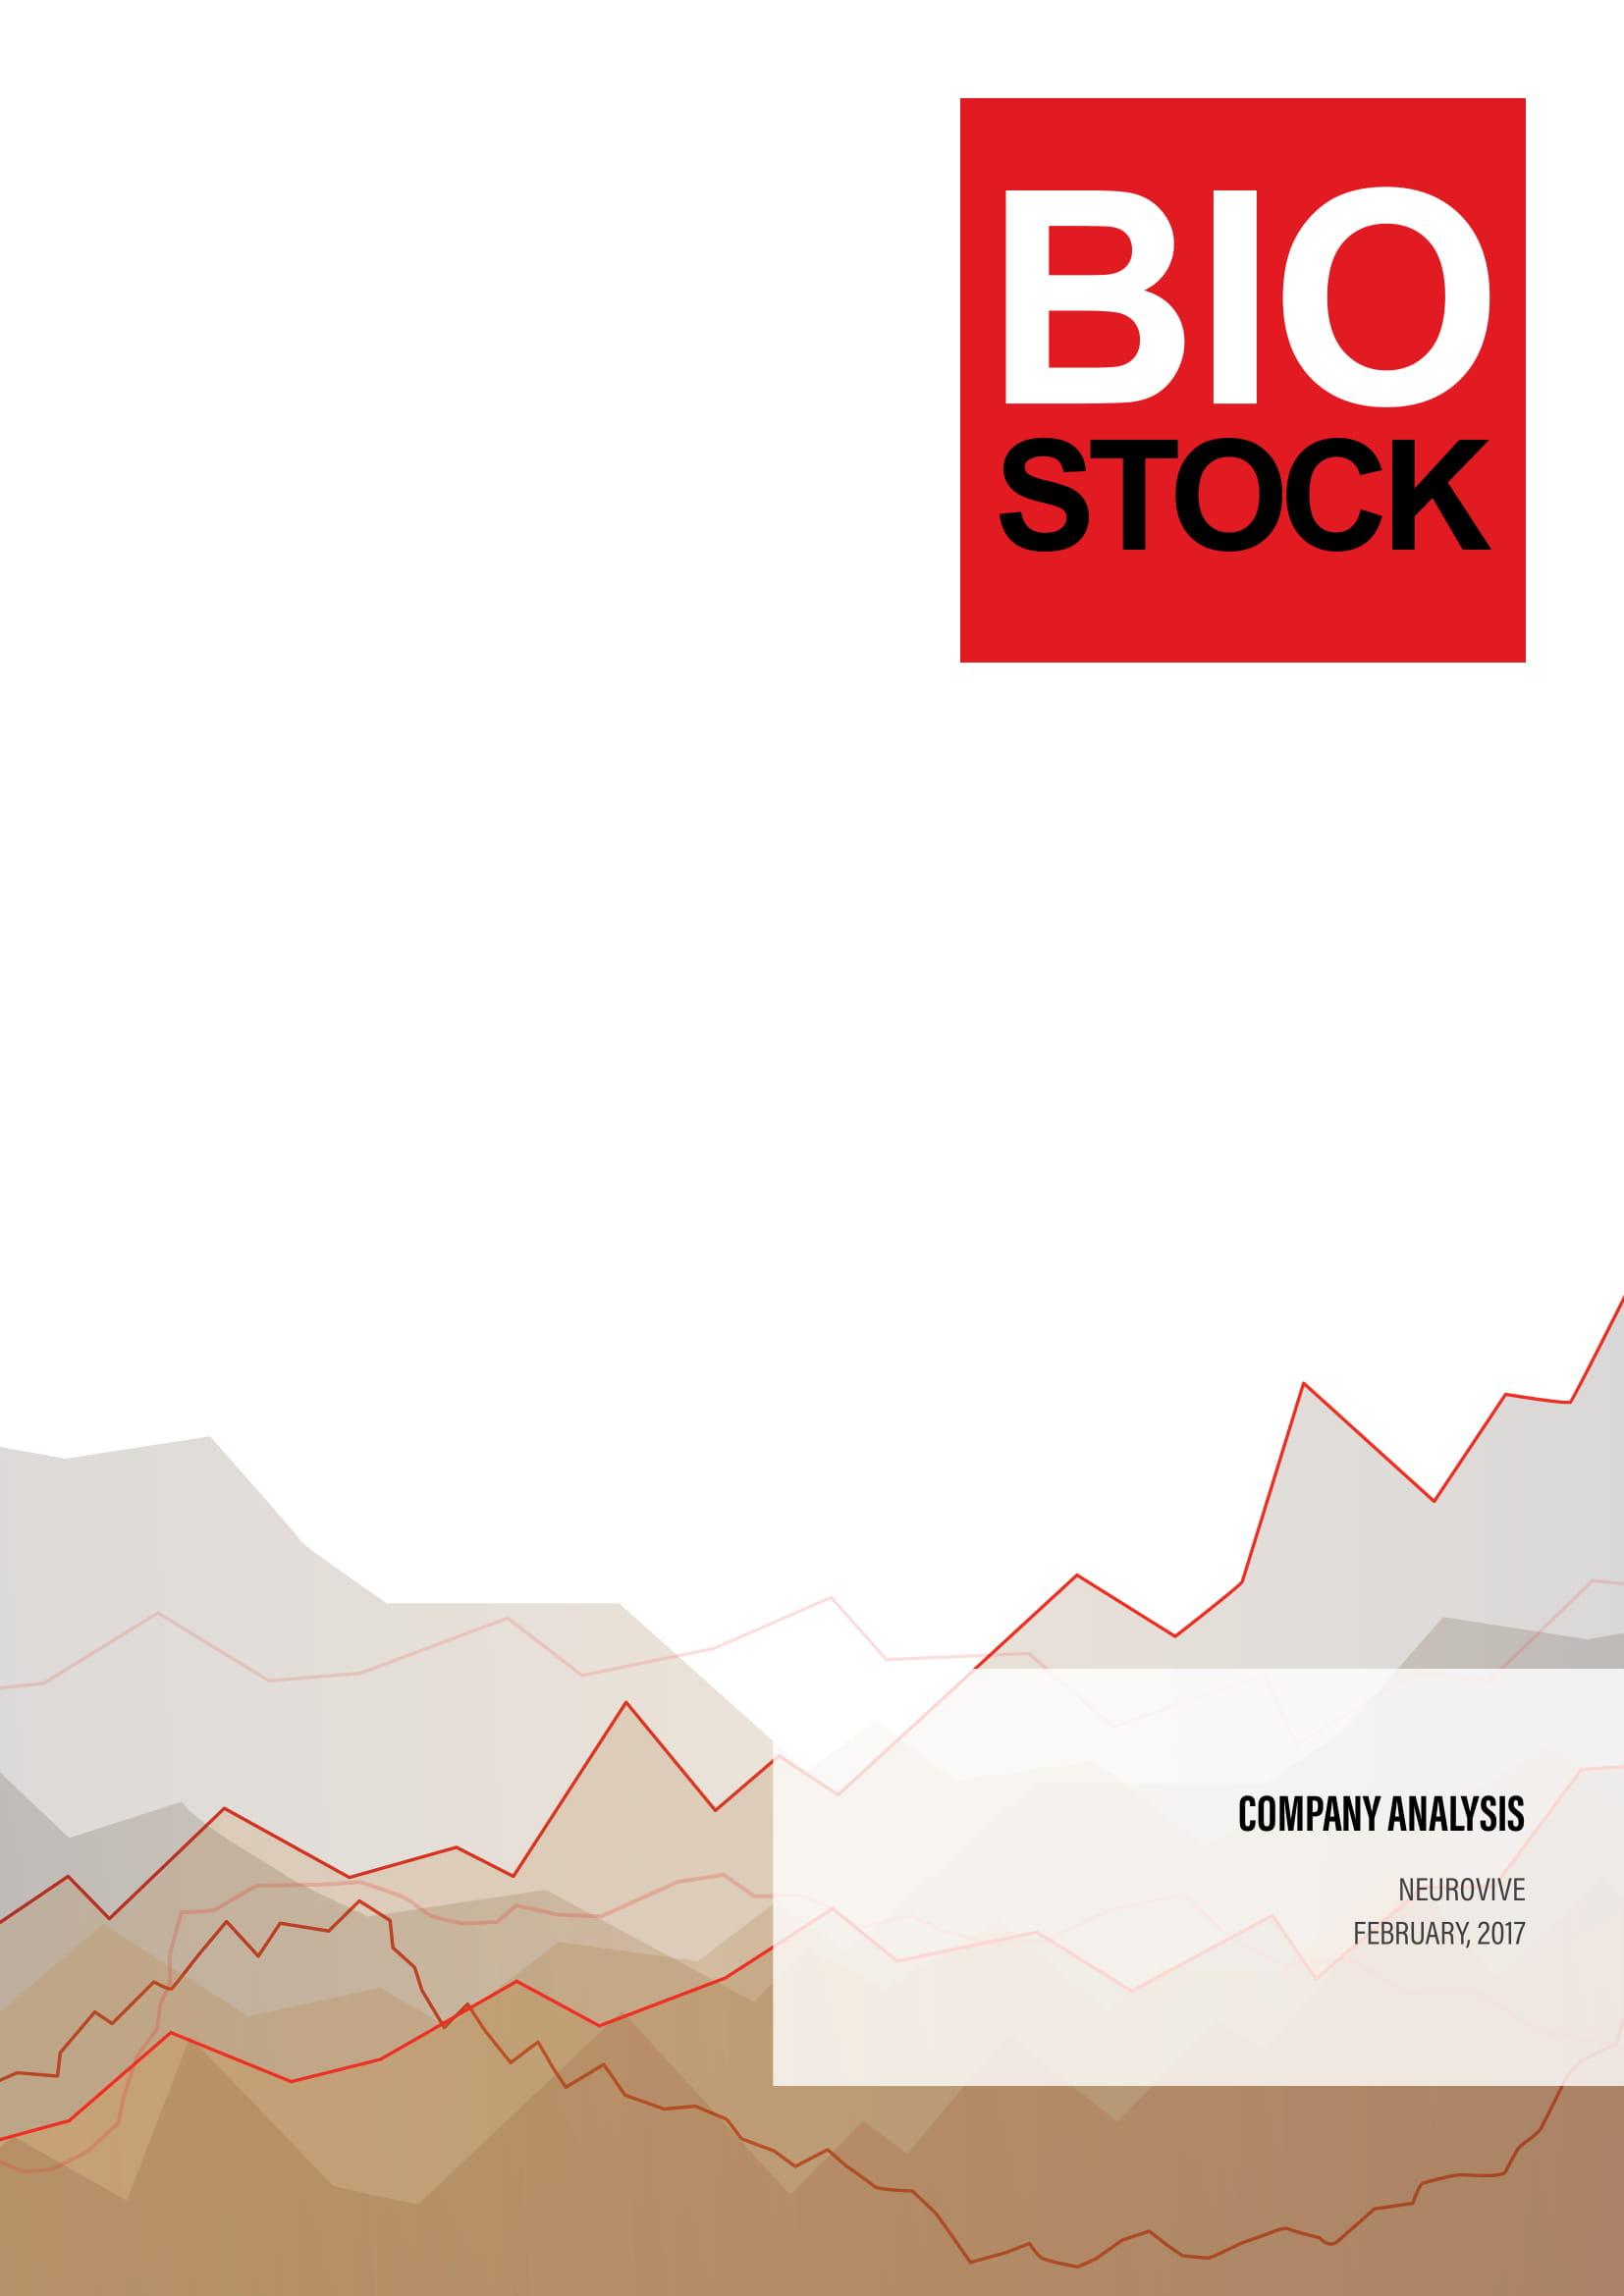 biostock company analysis example